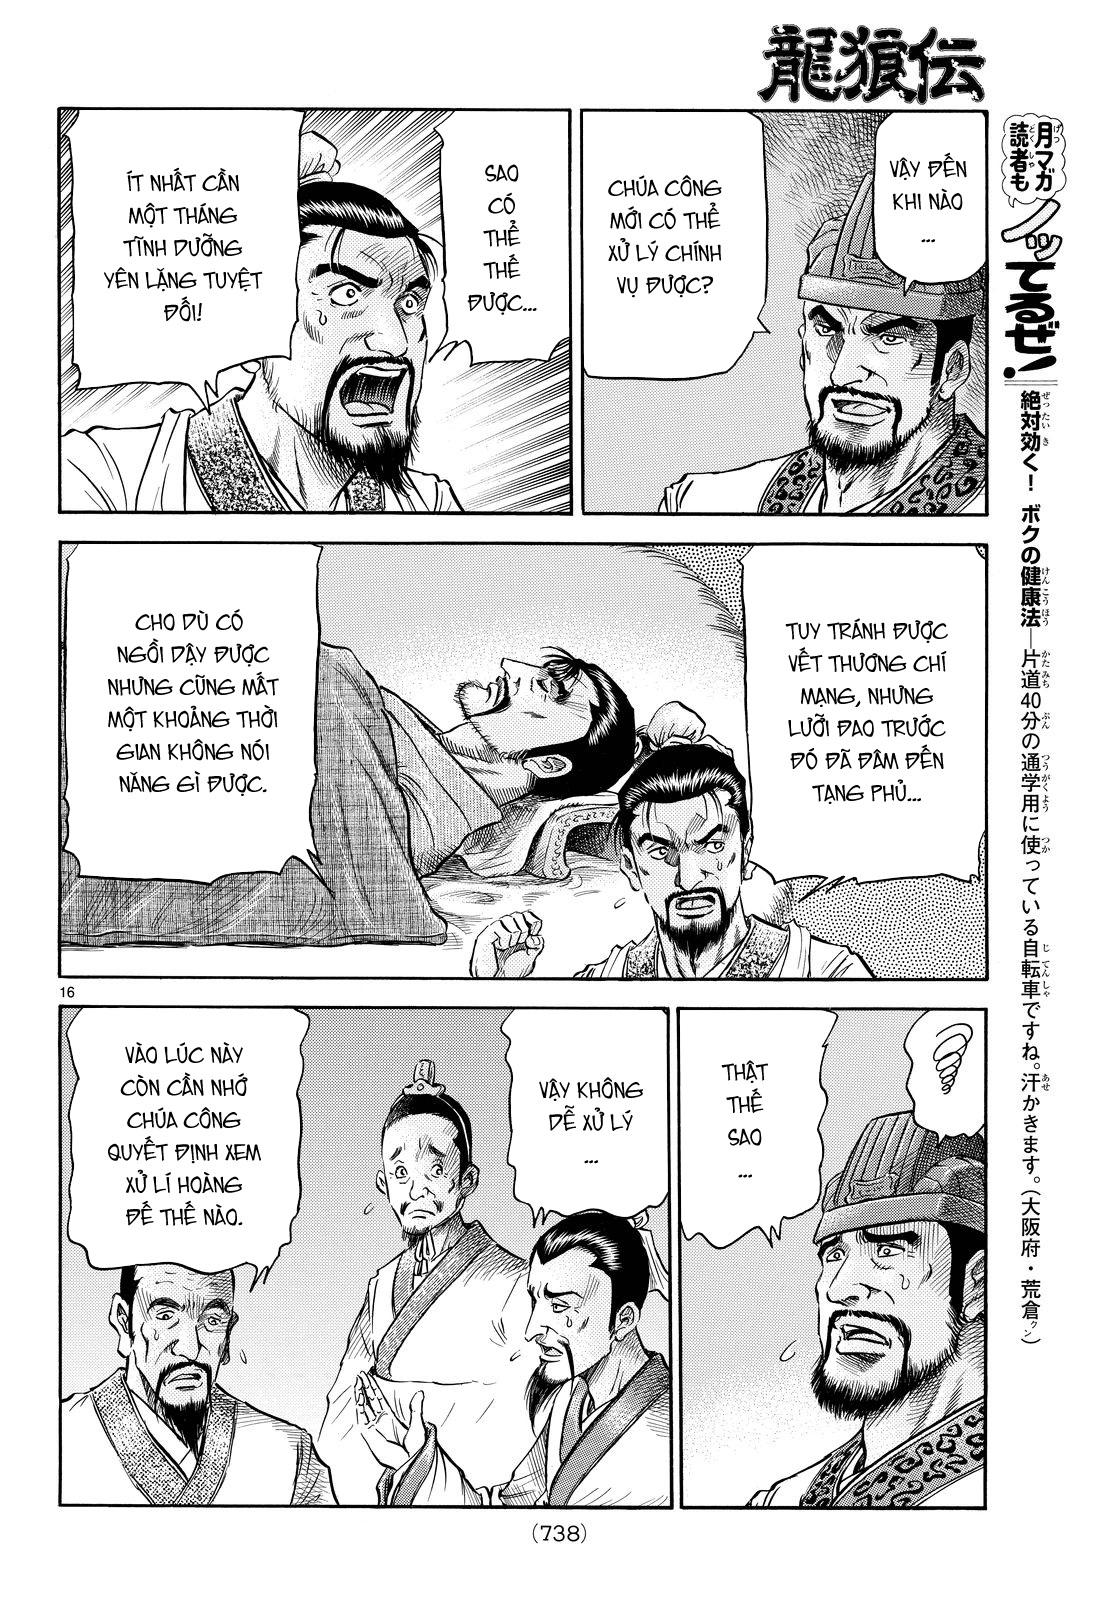 Ryuuroden chu be rong chap 265 trang 15 manga24h